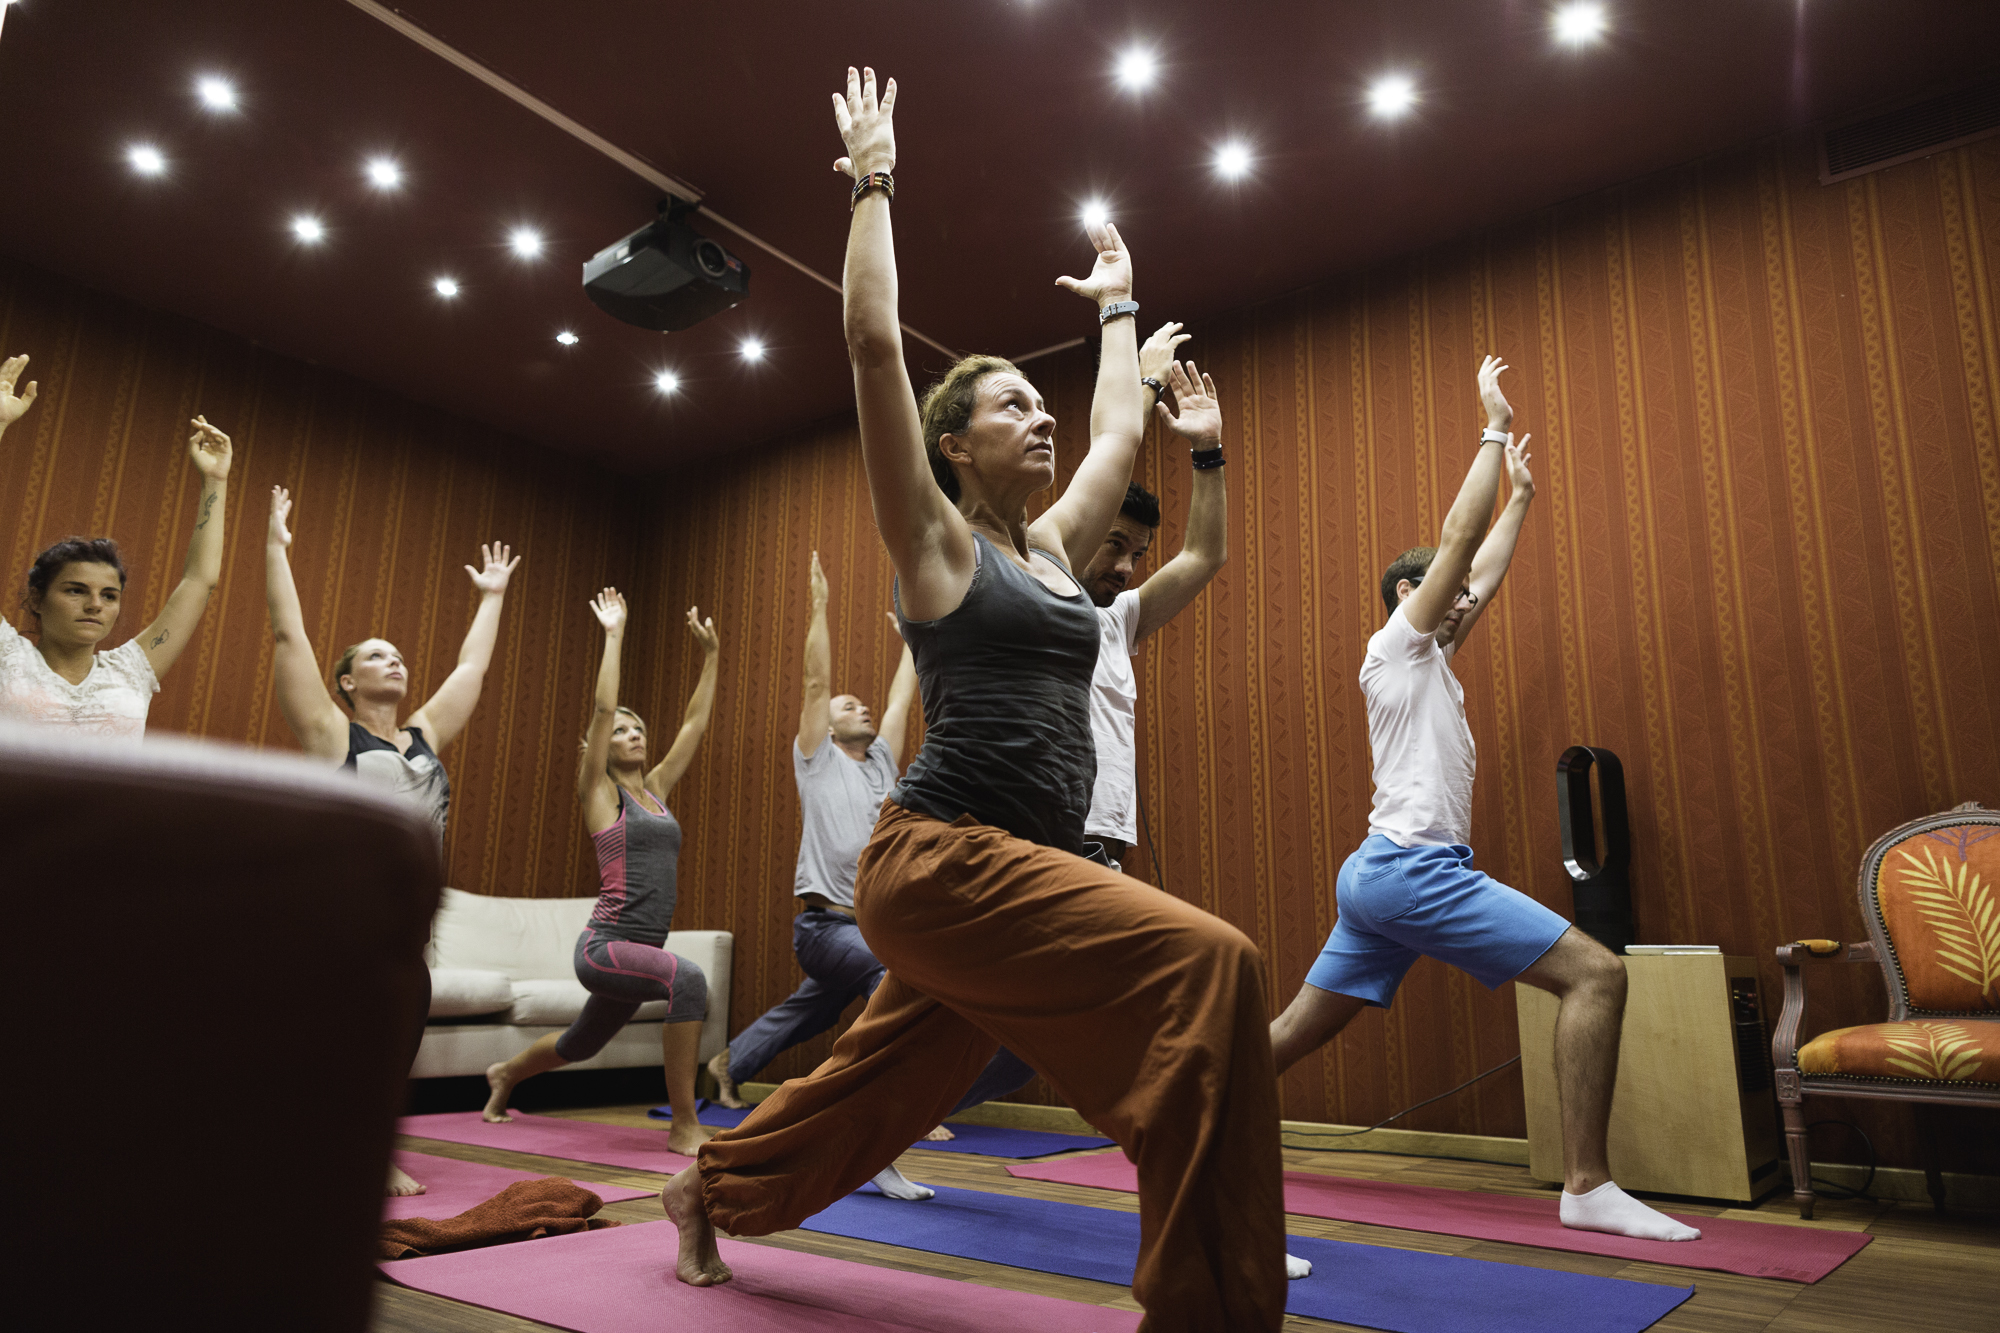 (c) Priscilla Stanley - Me Yoga Launch8